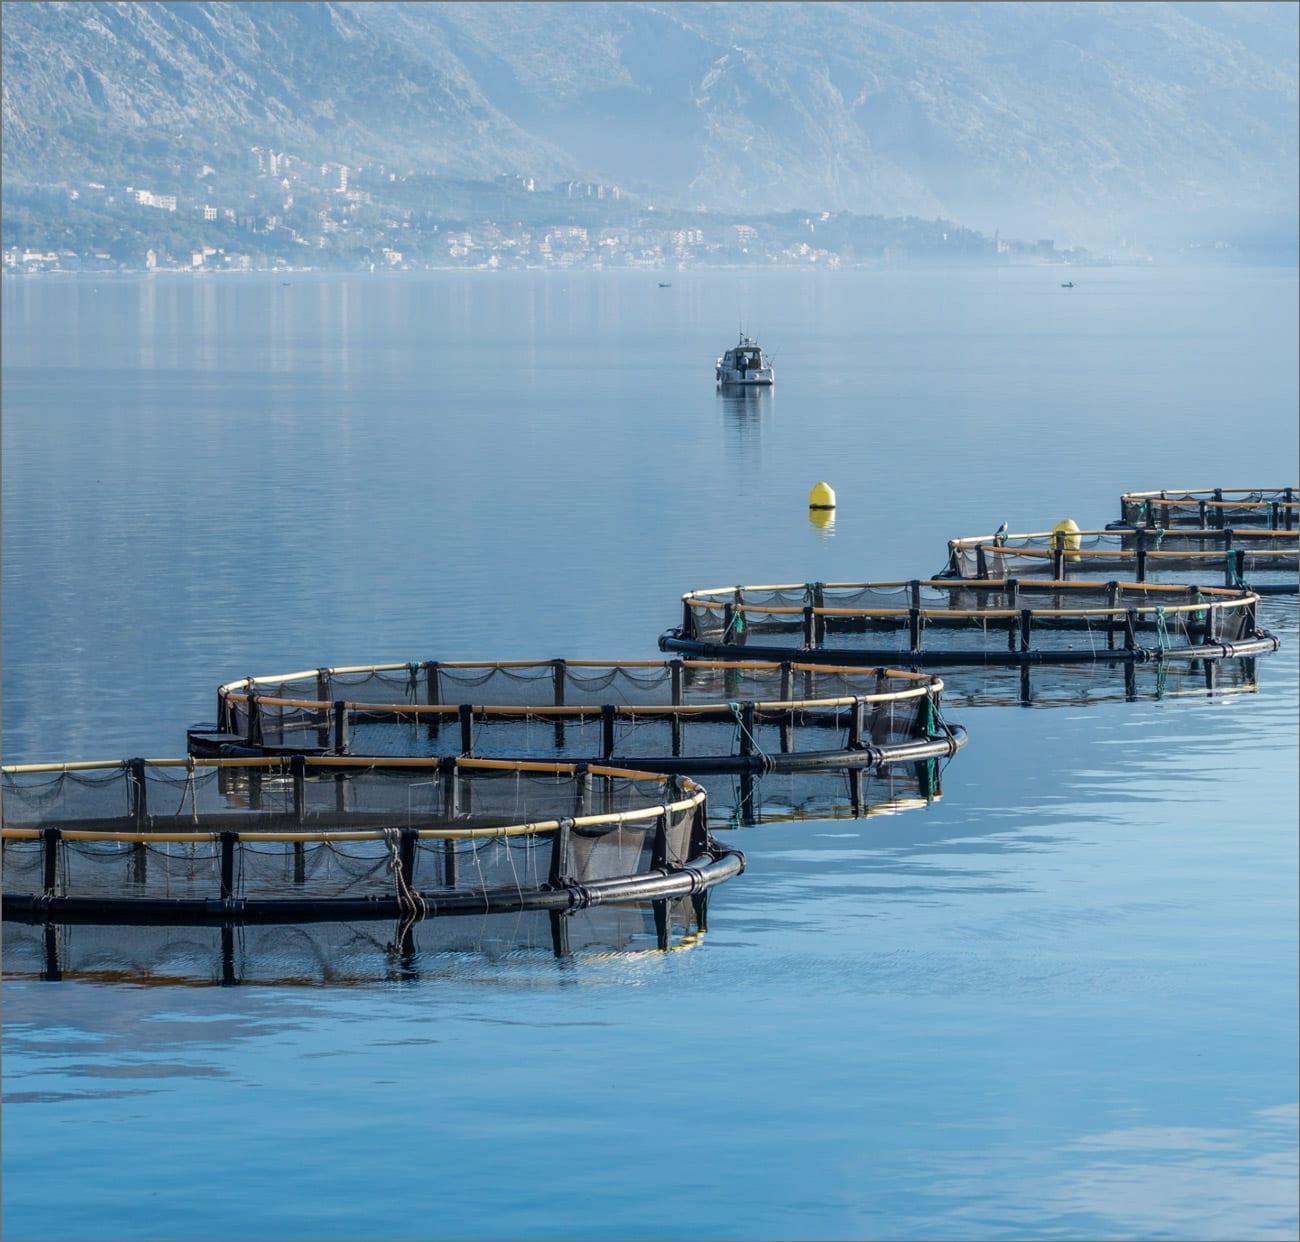 Viveros de acuicultura